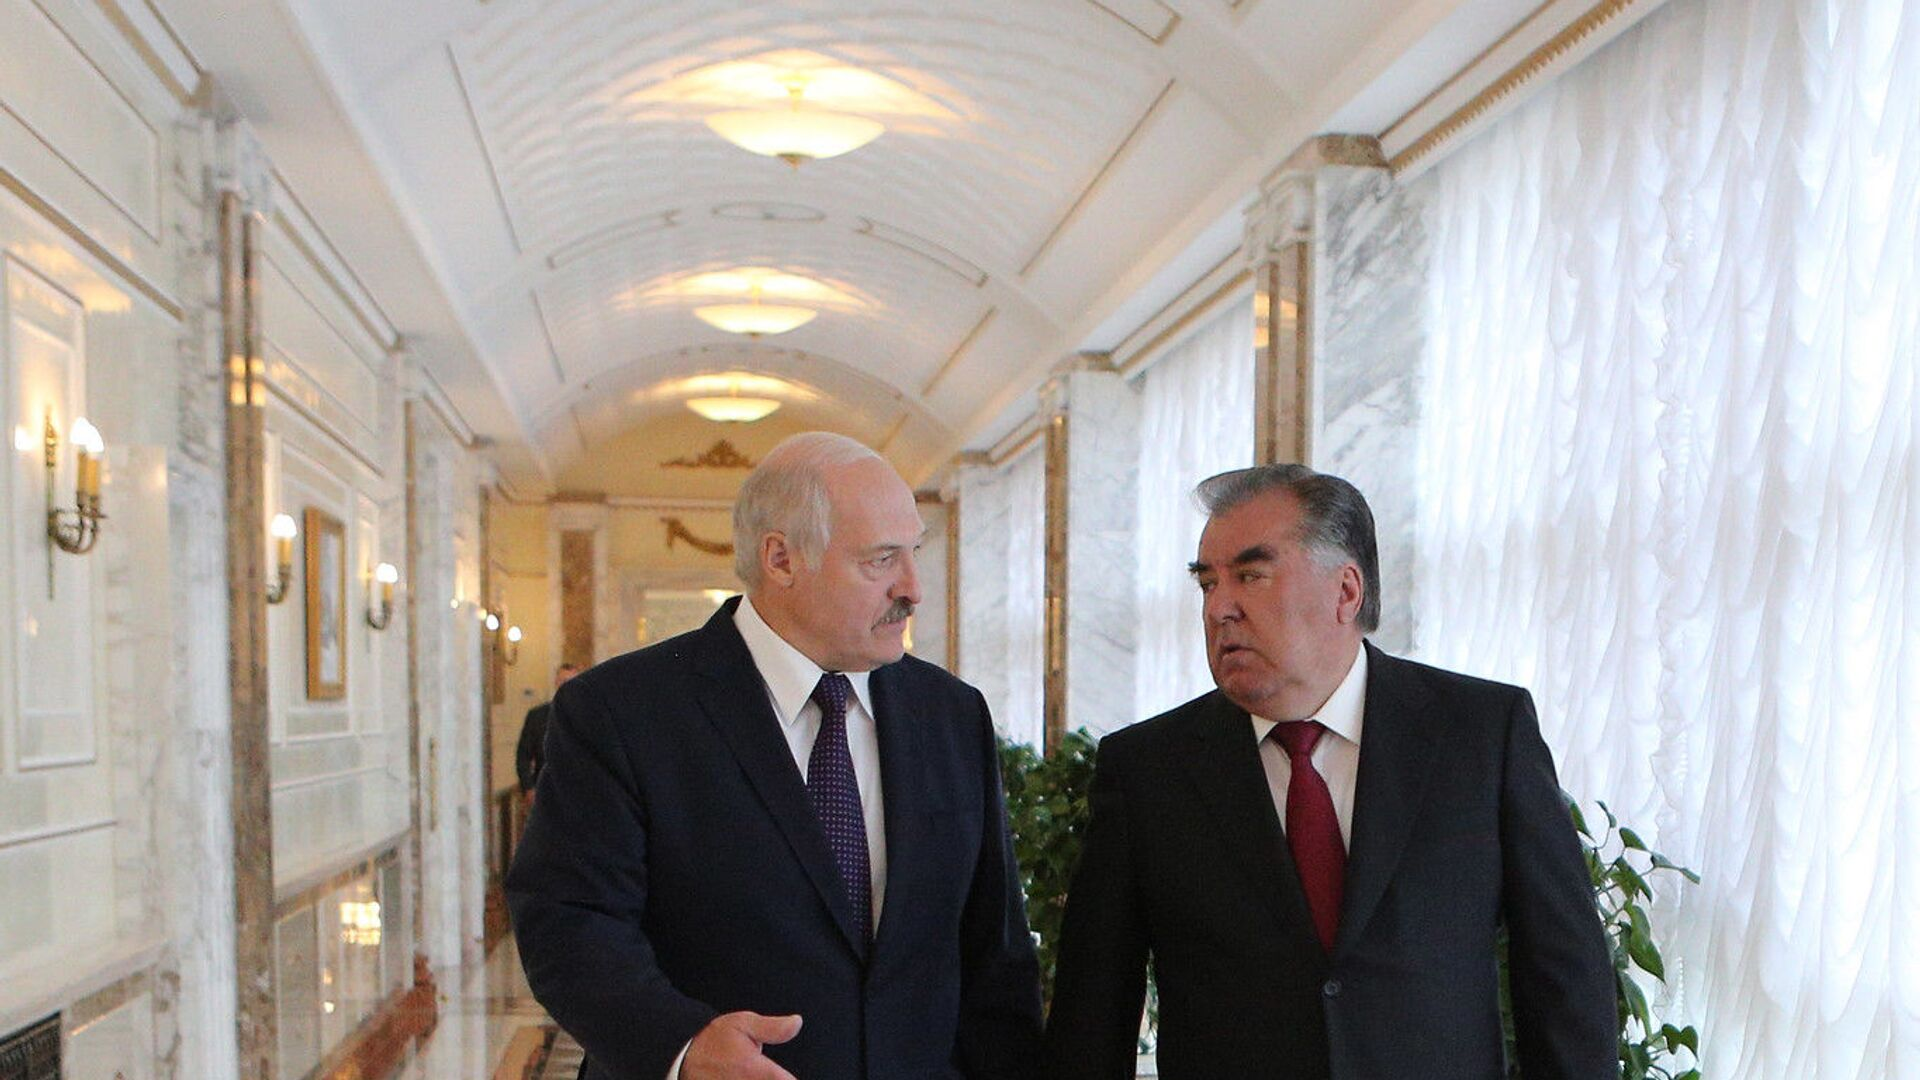 Президент Беларуси Александр Лукашенко и президент Таджикистана Эмомали Рахмон - Sputnik Таджикистан, 1920, 05.09.2021